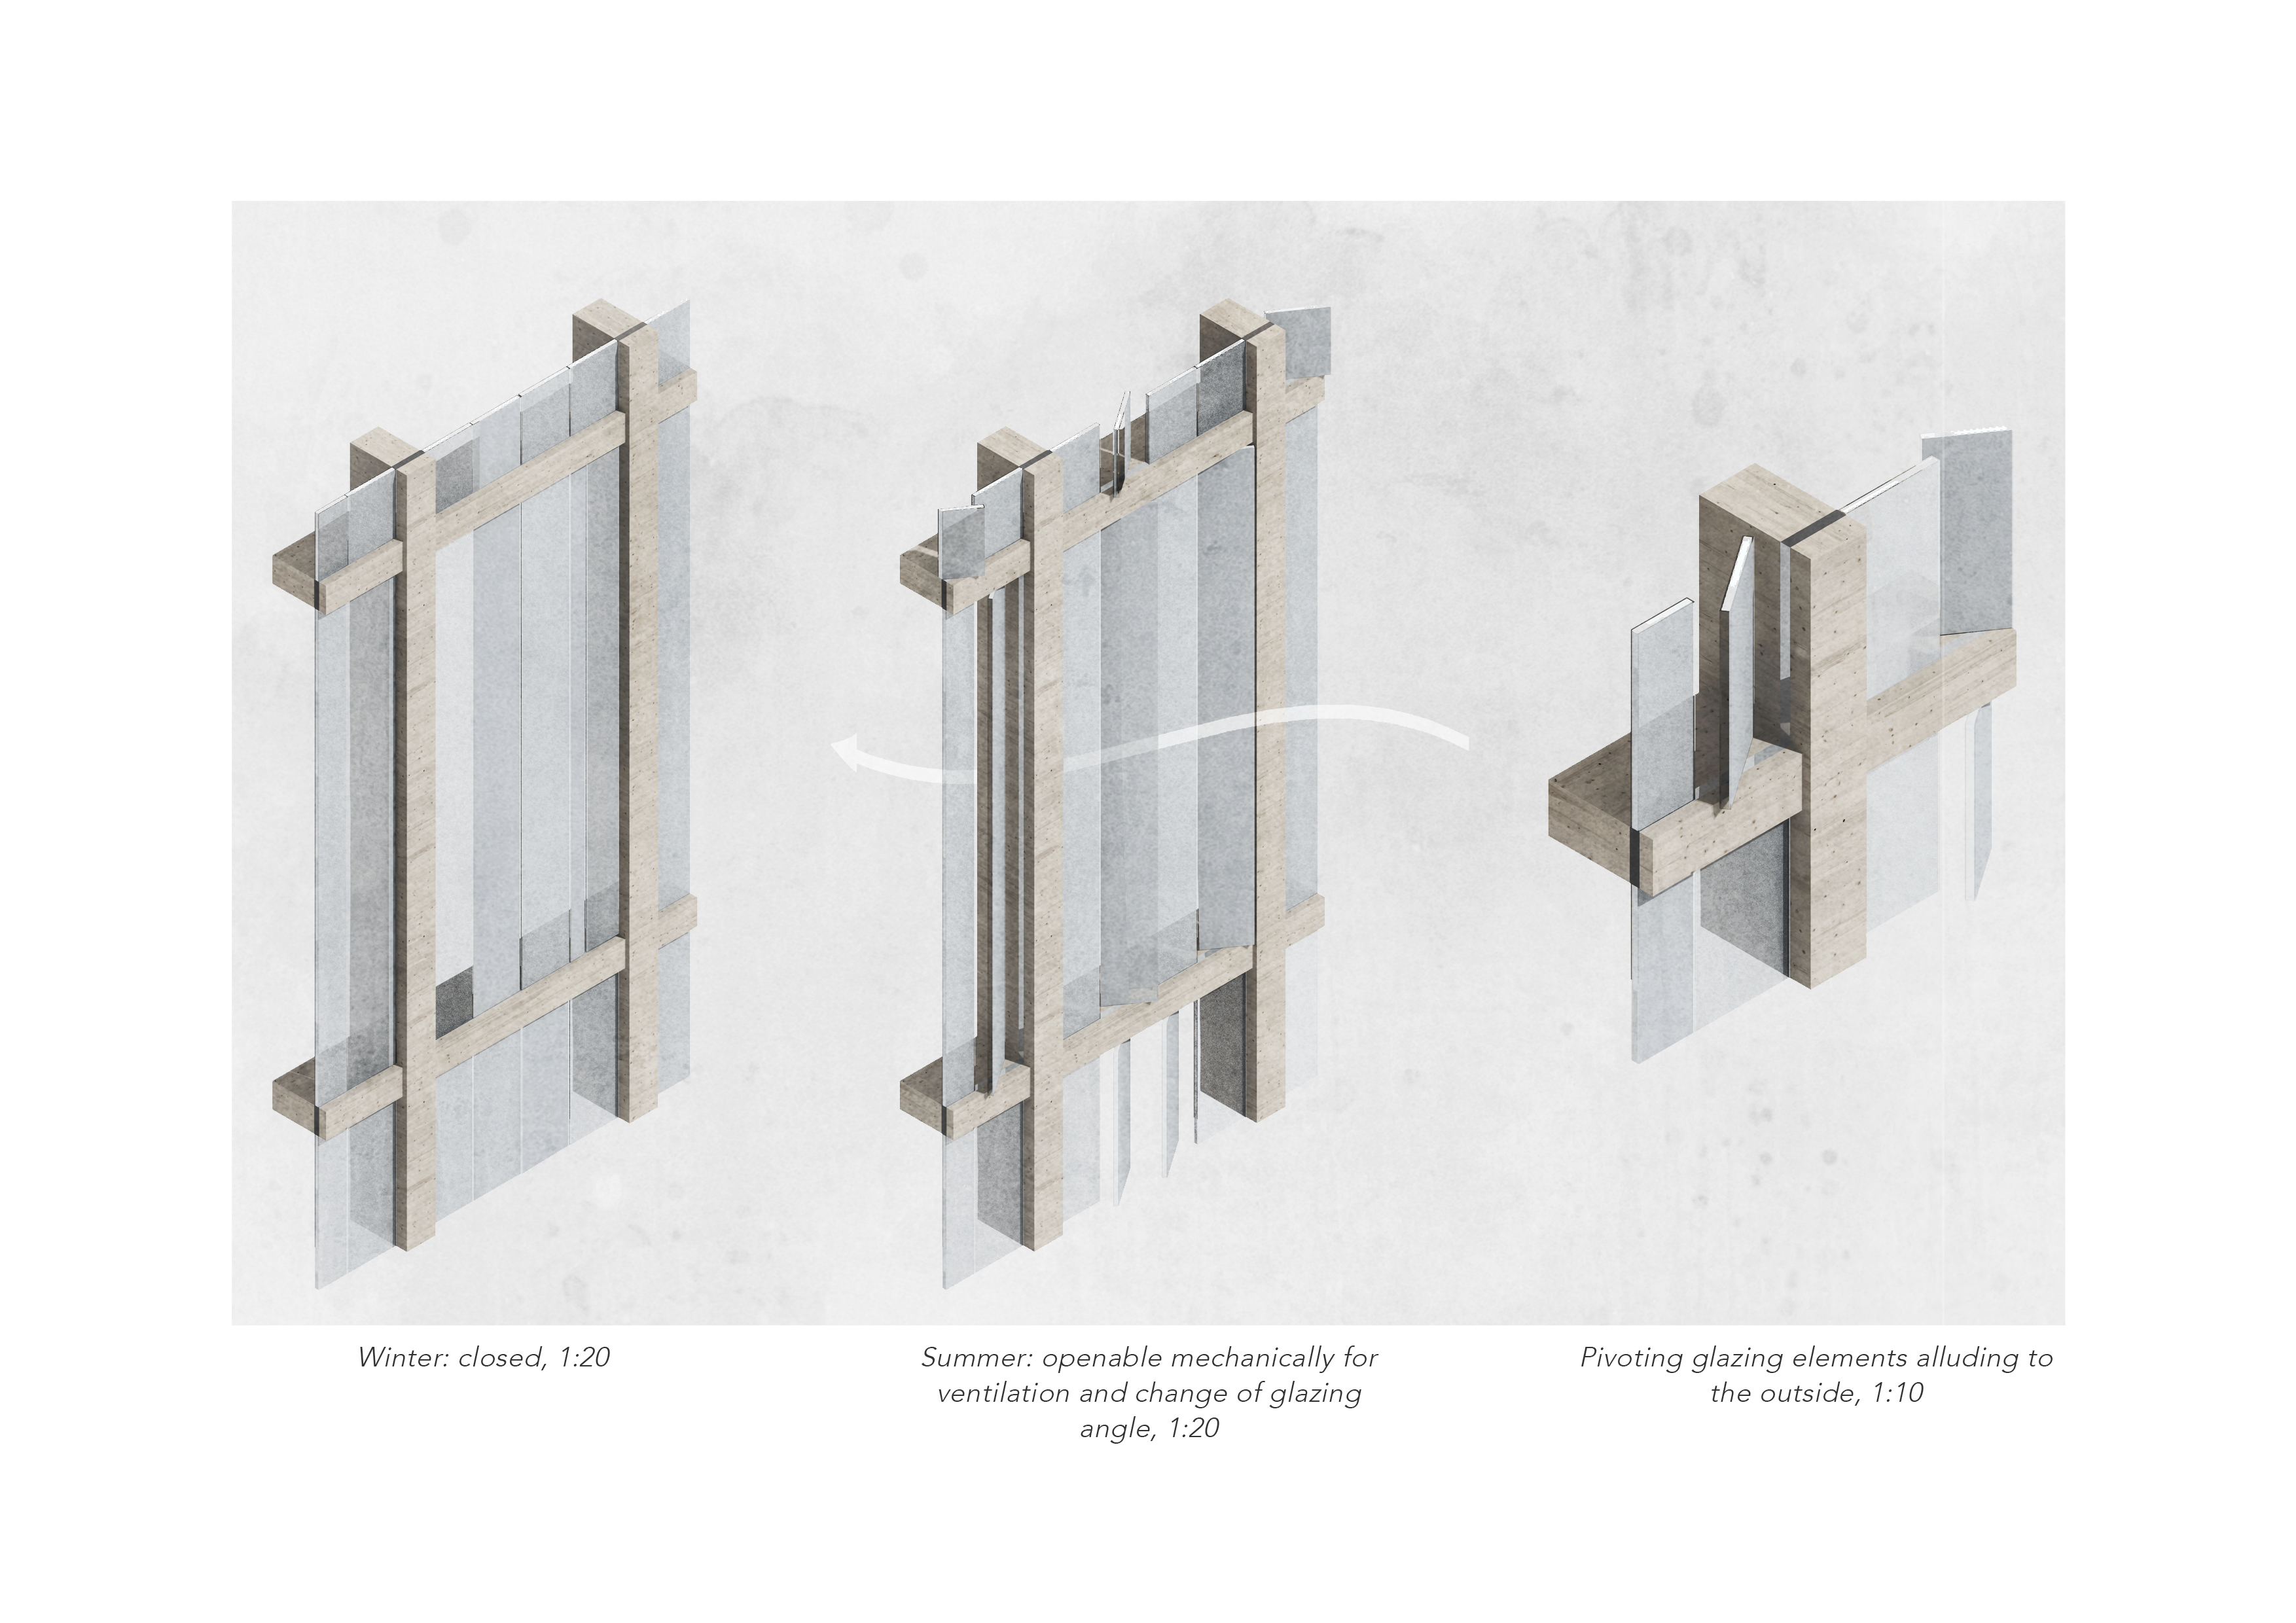 Facade ventilation system